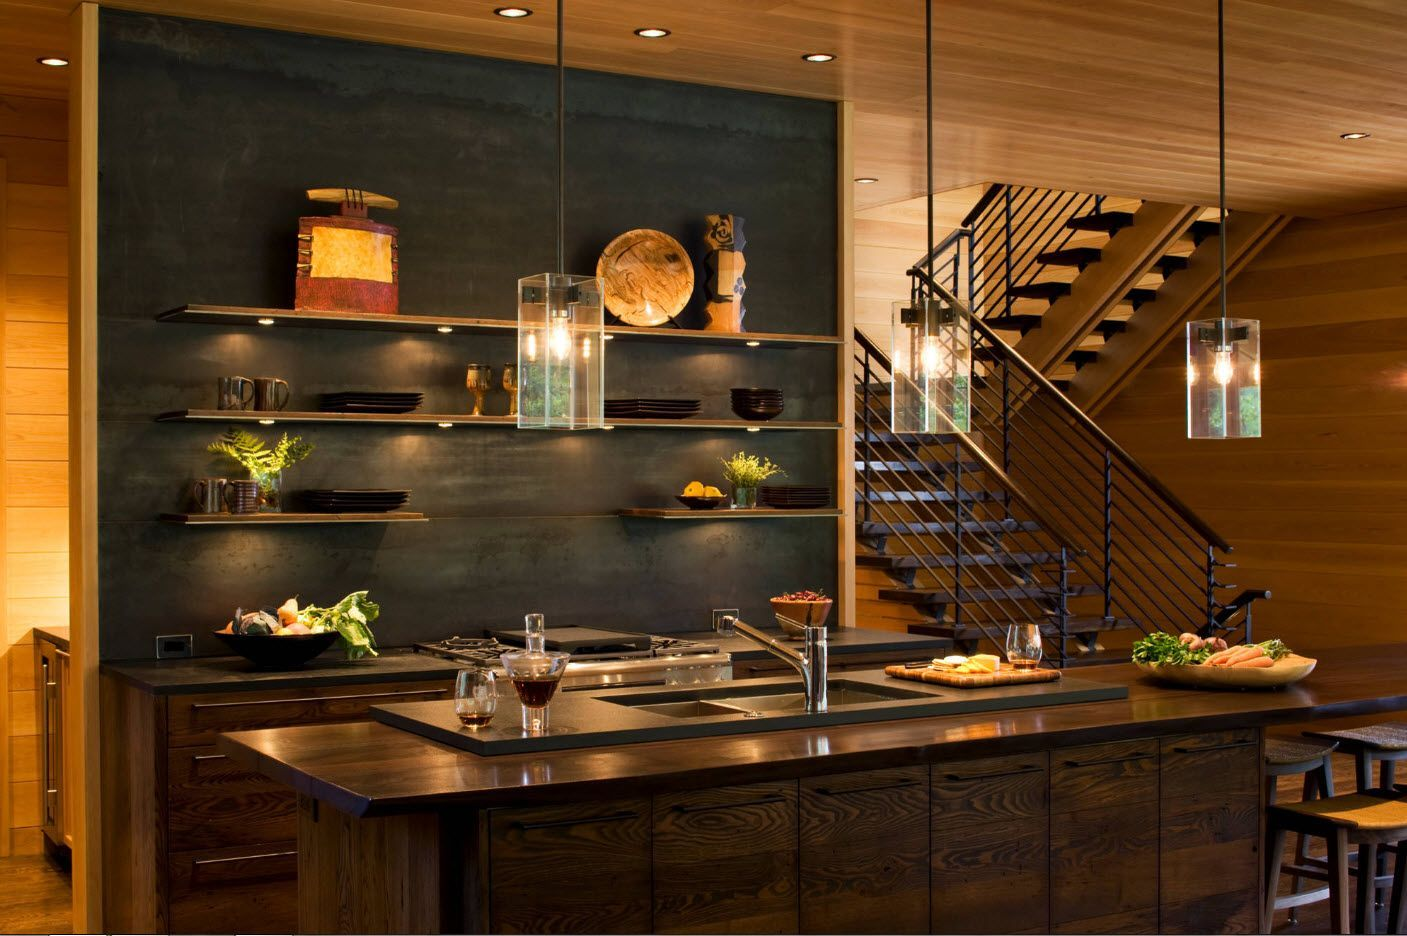 Fantasy kitchen interior 2017 with intuitive wooden palette